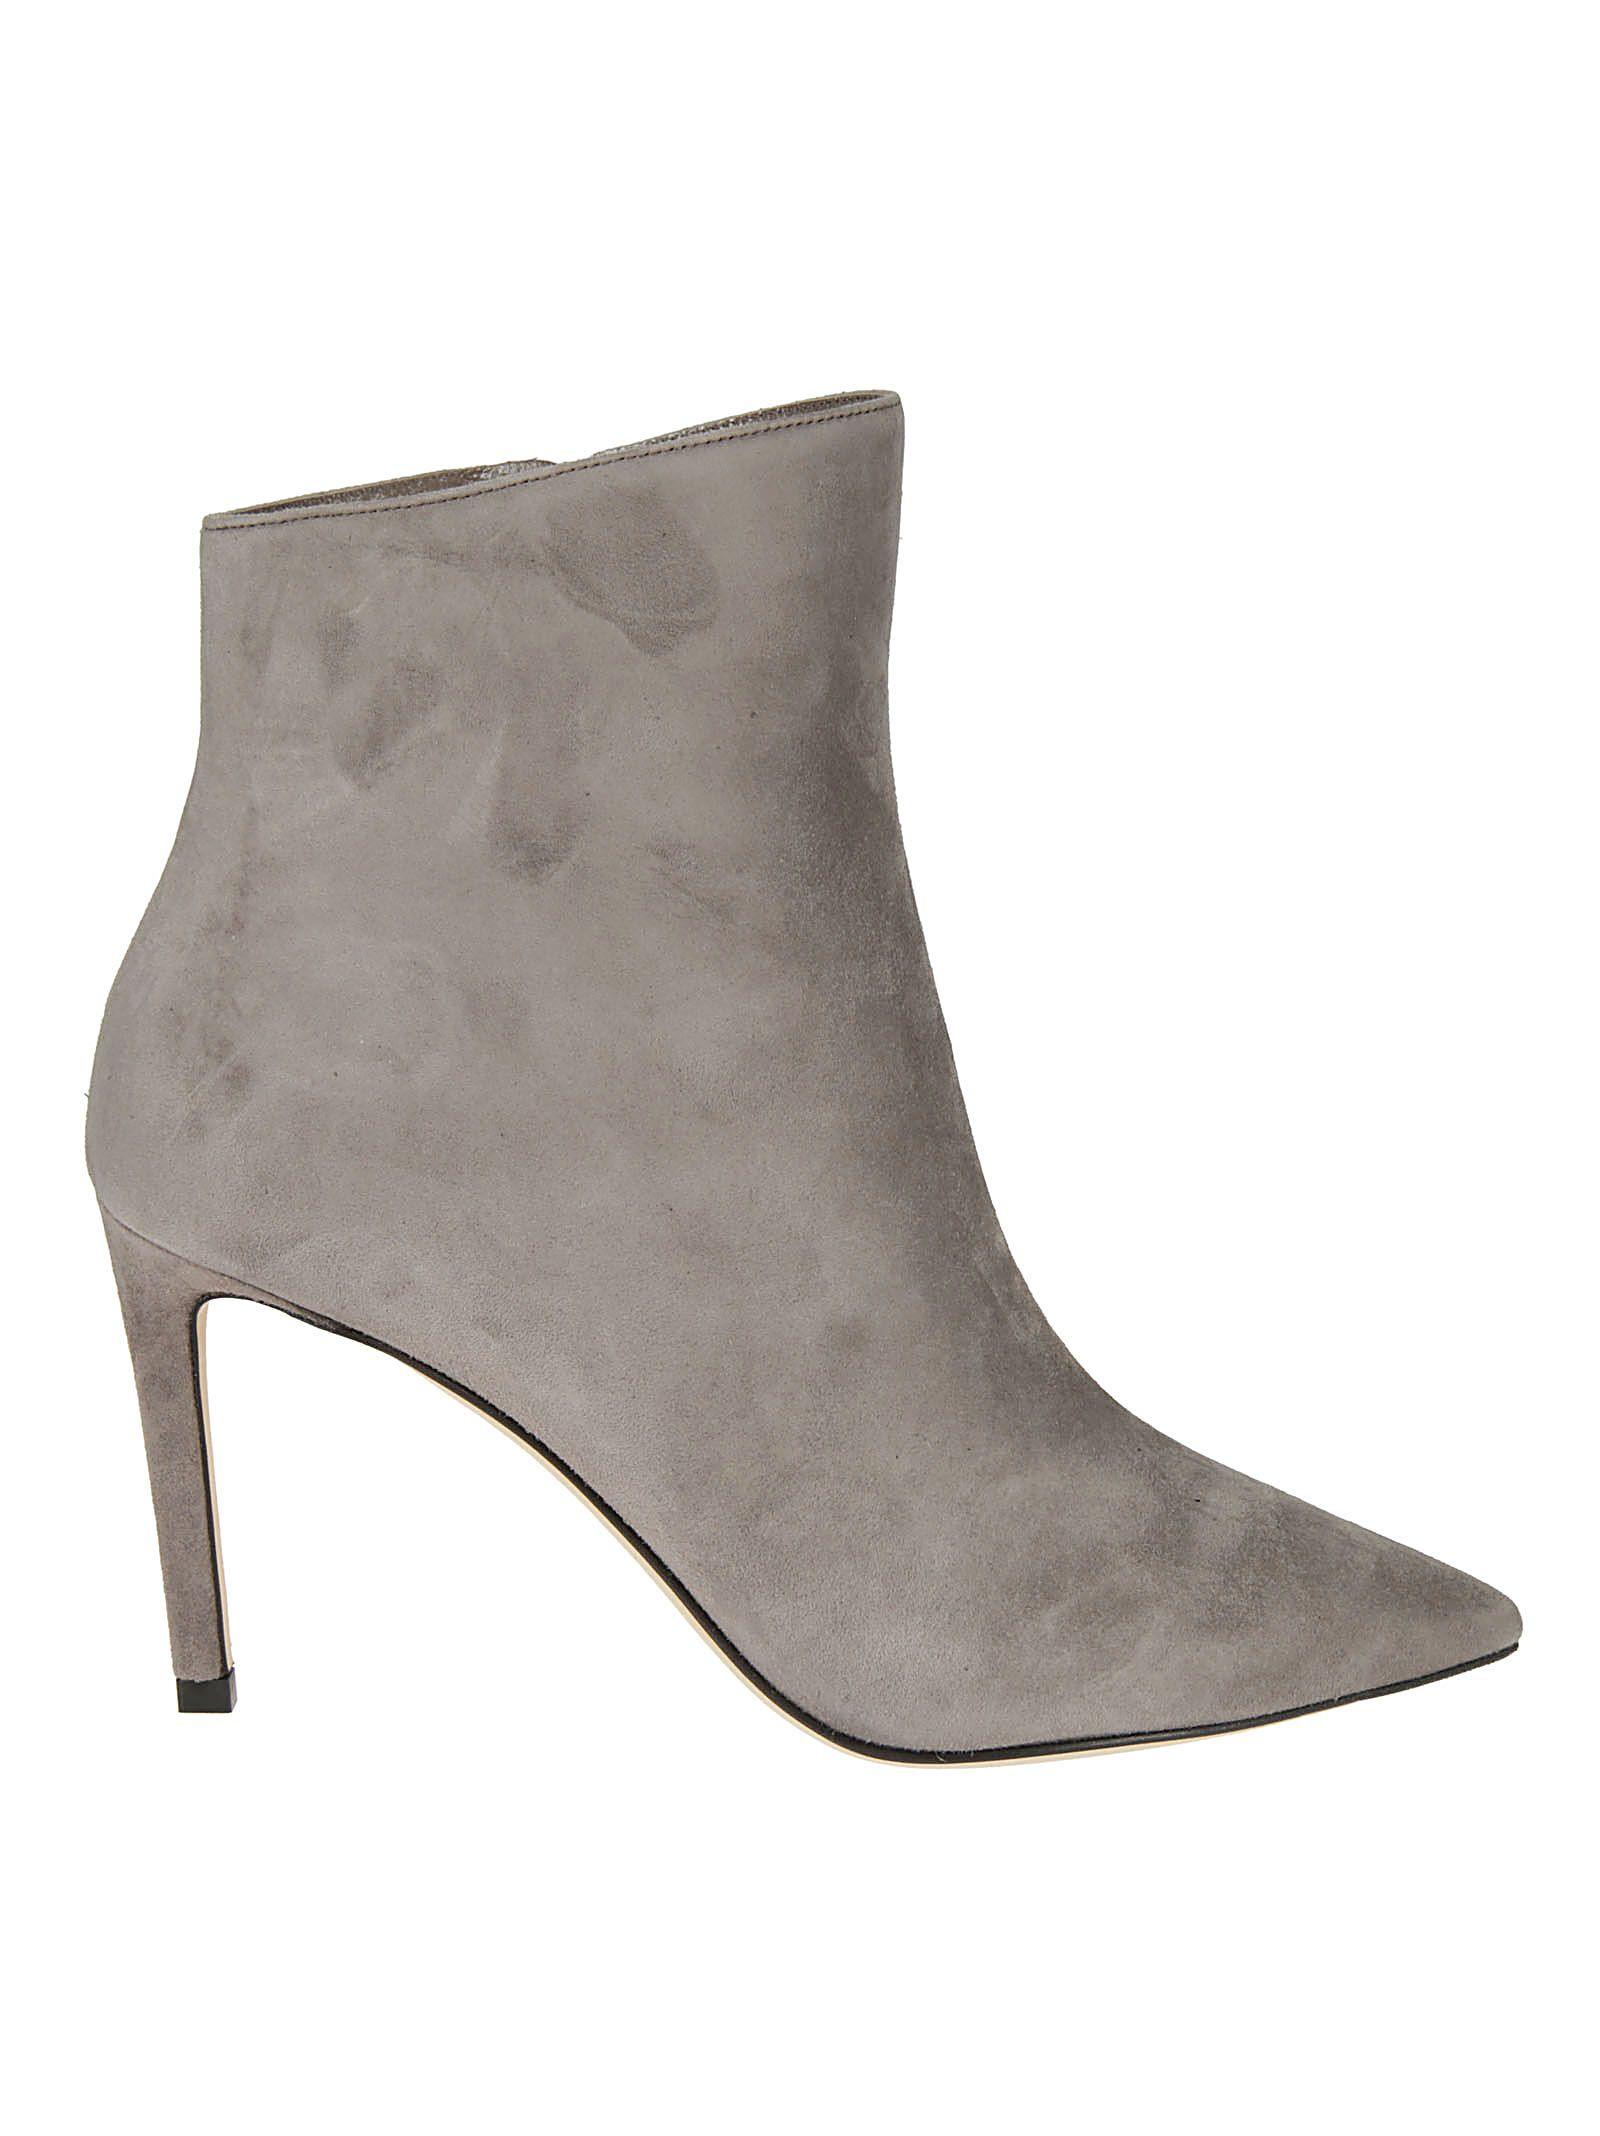 8e3ffa17142 Jimmy Choo Helaine Boots. Italist